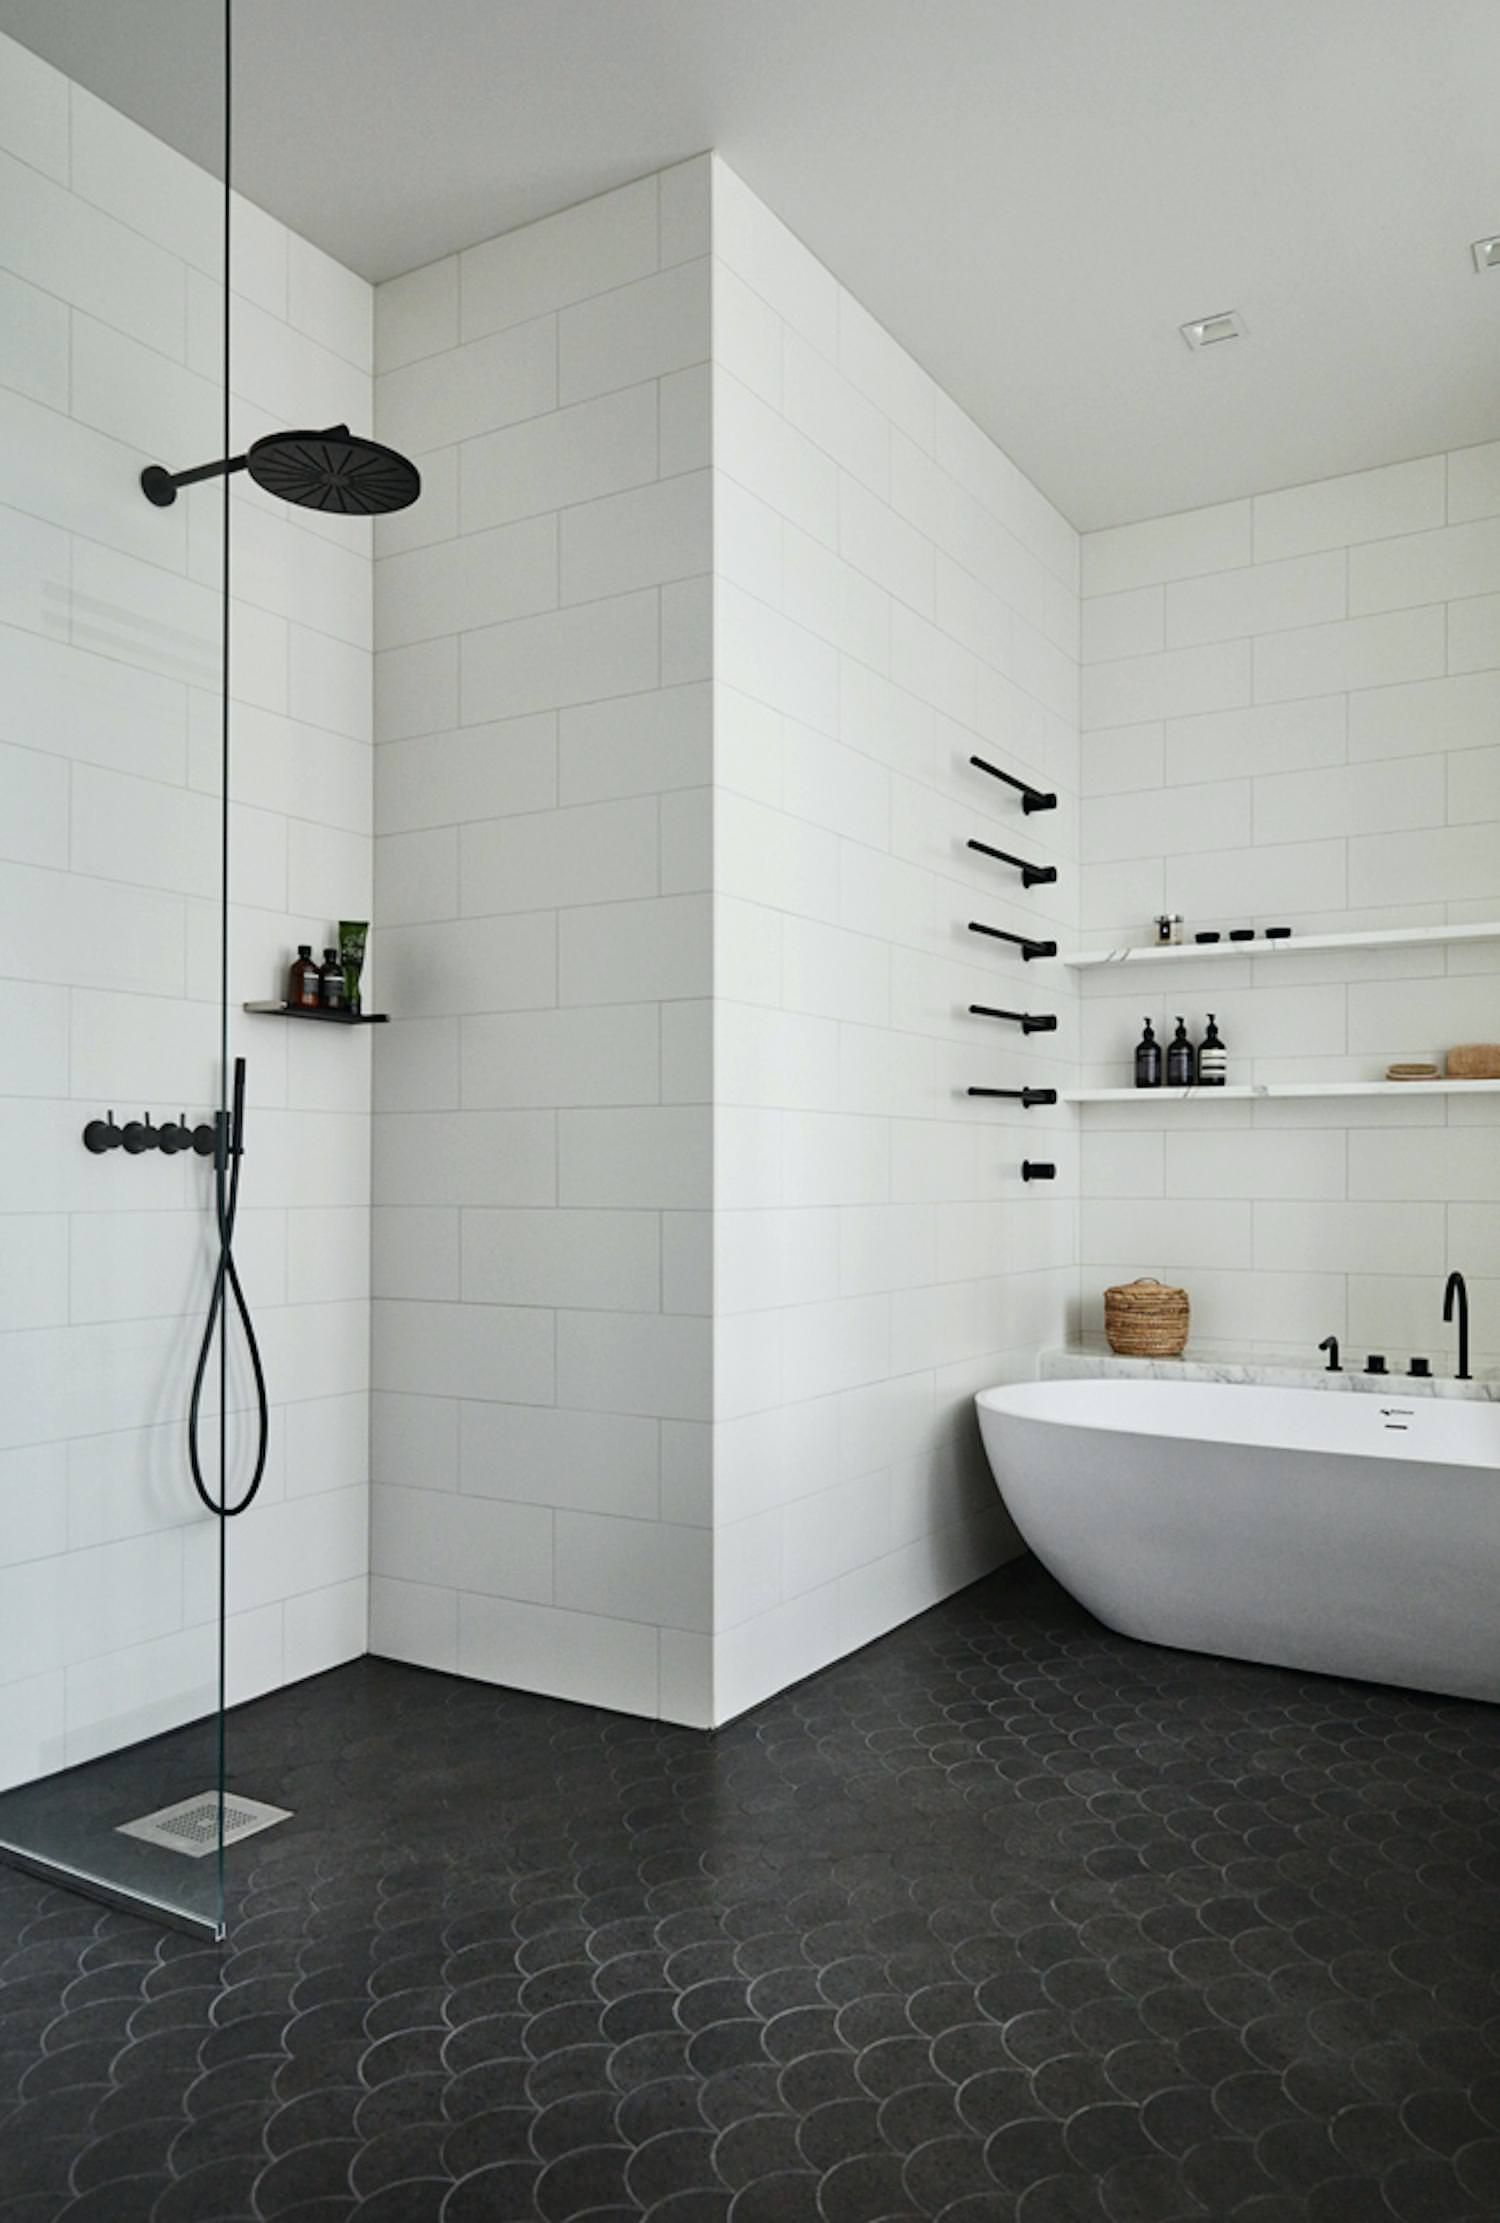 2018 Design Trends For The Bathroom Powder Room